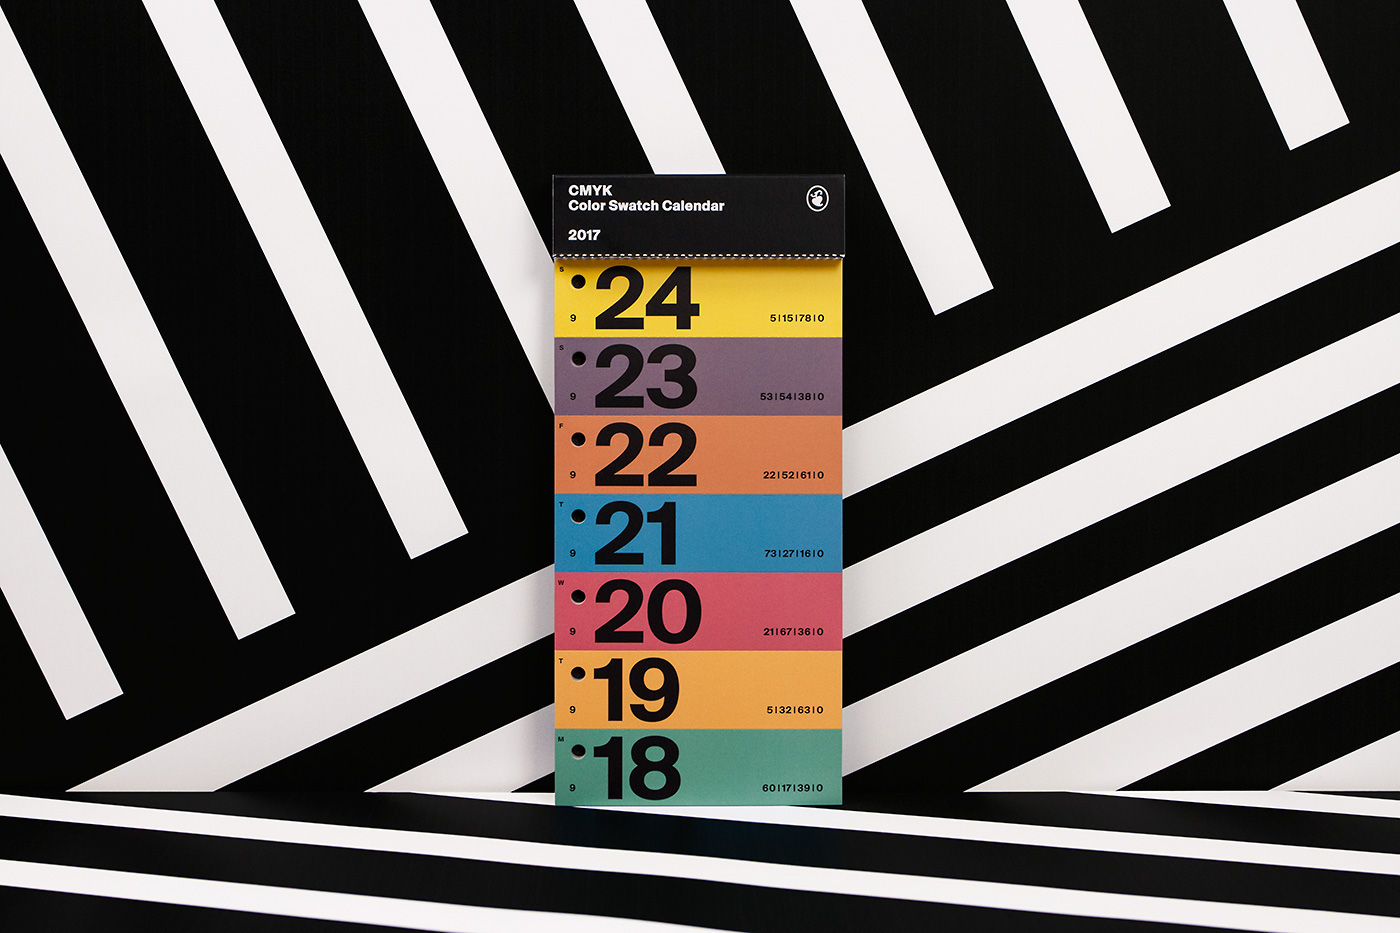 Color Swatch Calendar 2017 12